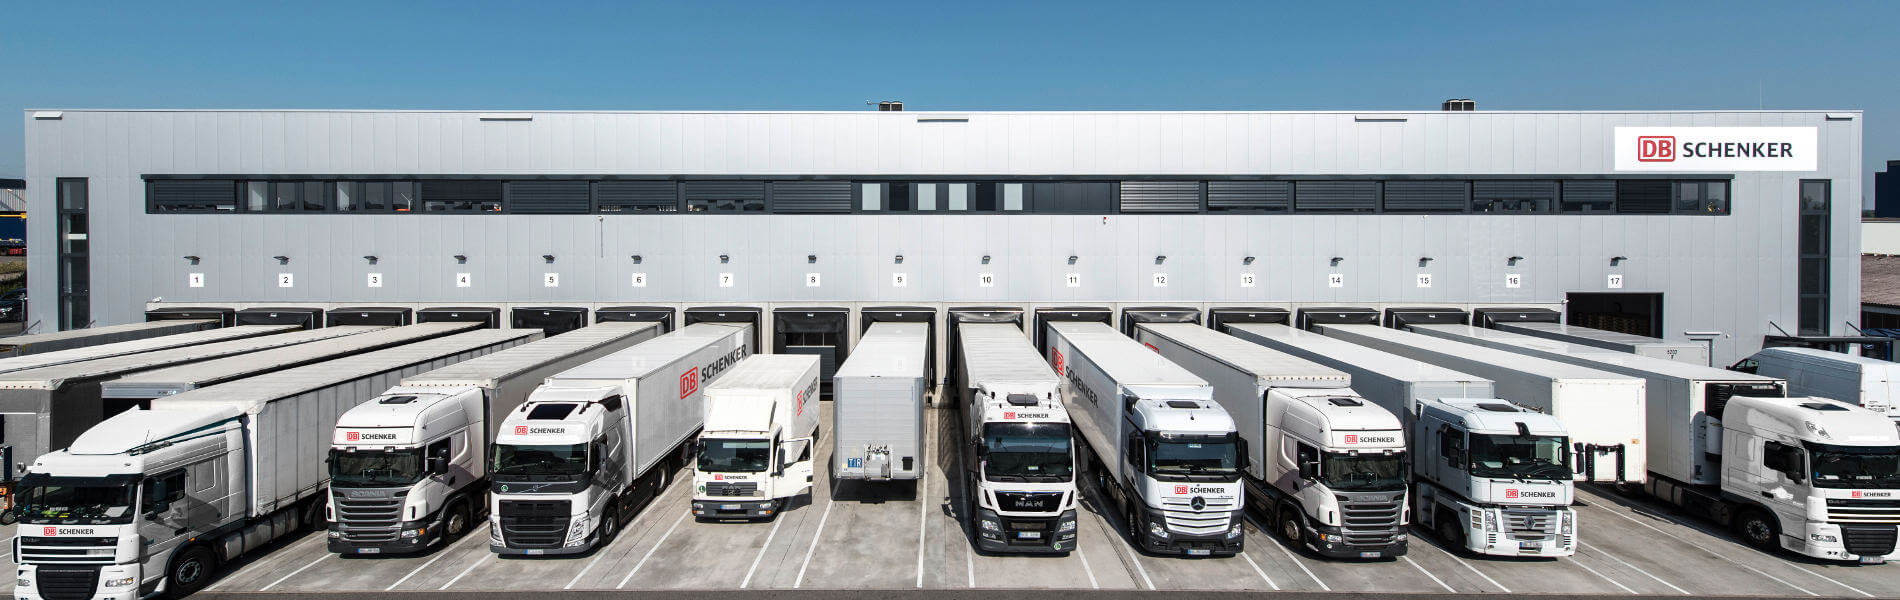 Logistikimmobilien: 3 Trends für Logistikflächen